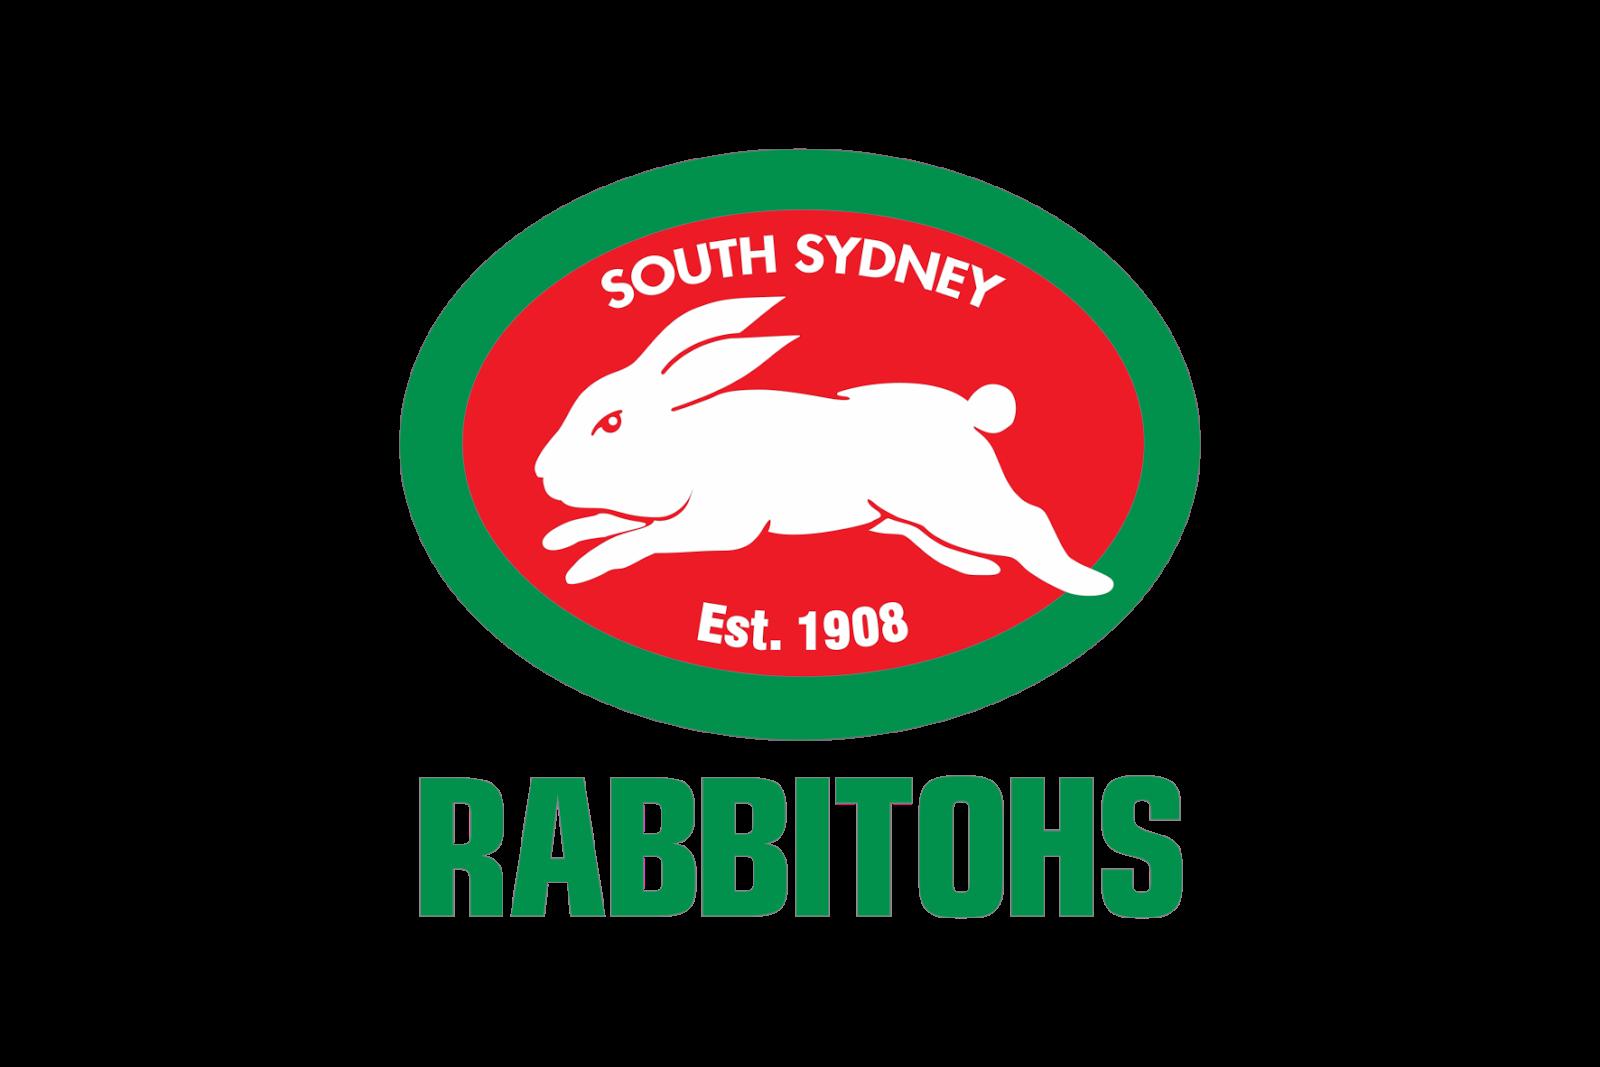 rabbitohs - photo #6